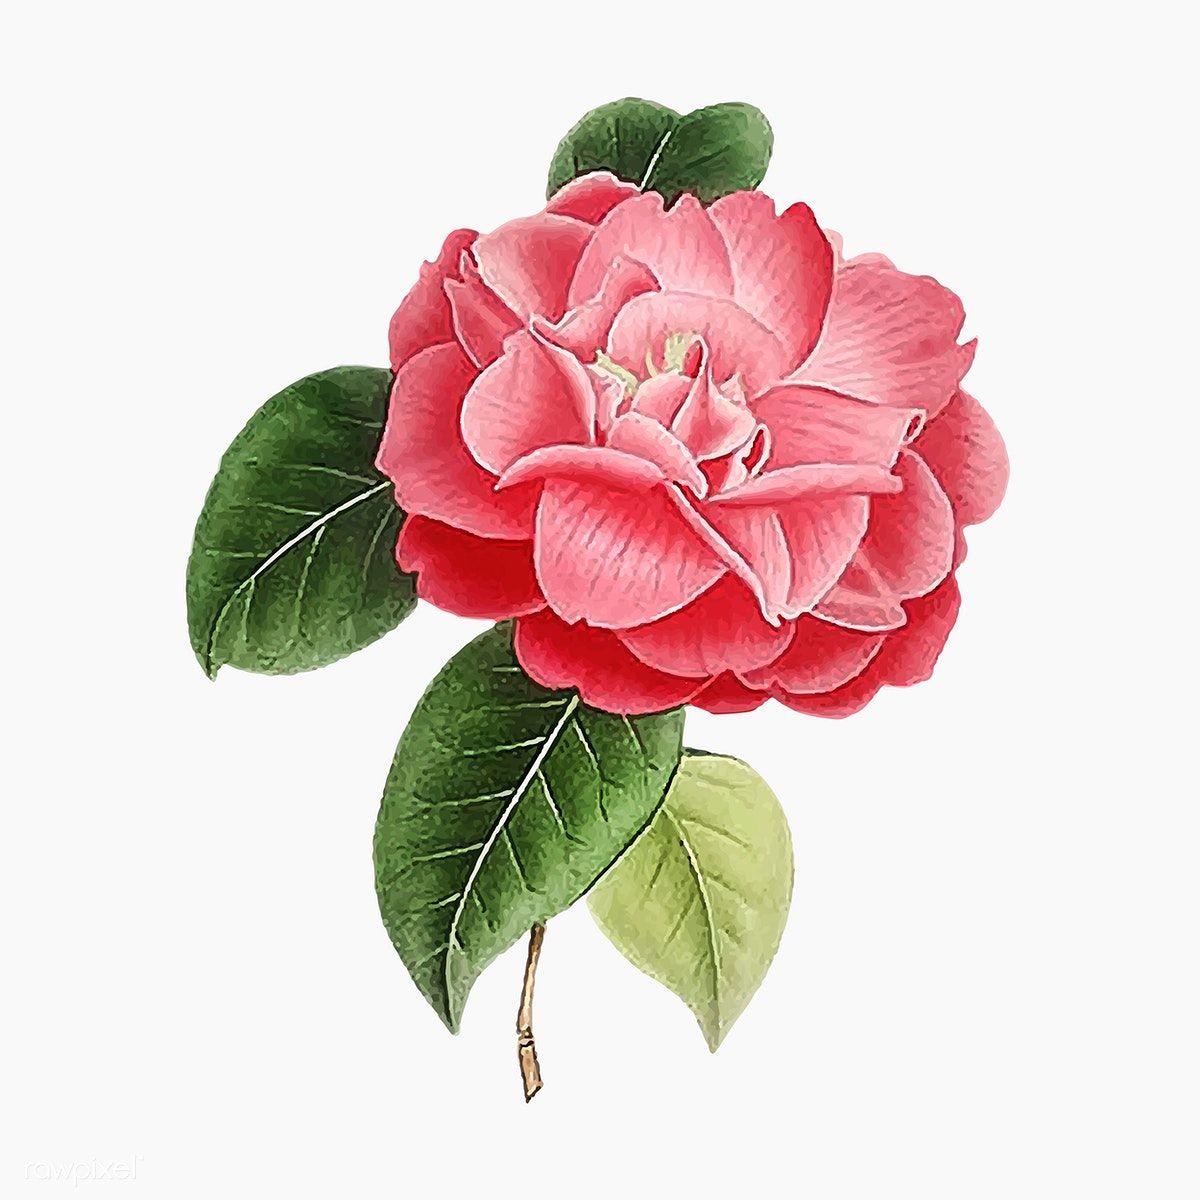 Download Premium Vector Of Pink Camellia Rose Flower Vector 2090052 In 2020 Rose Flower Flower Illustration Camellia Flower